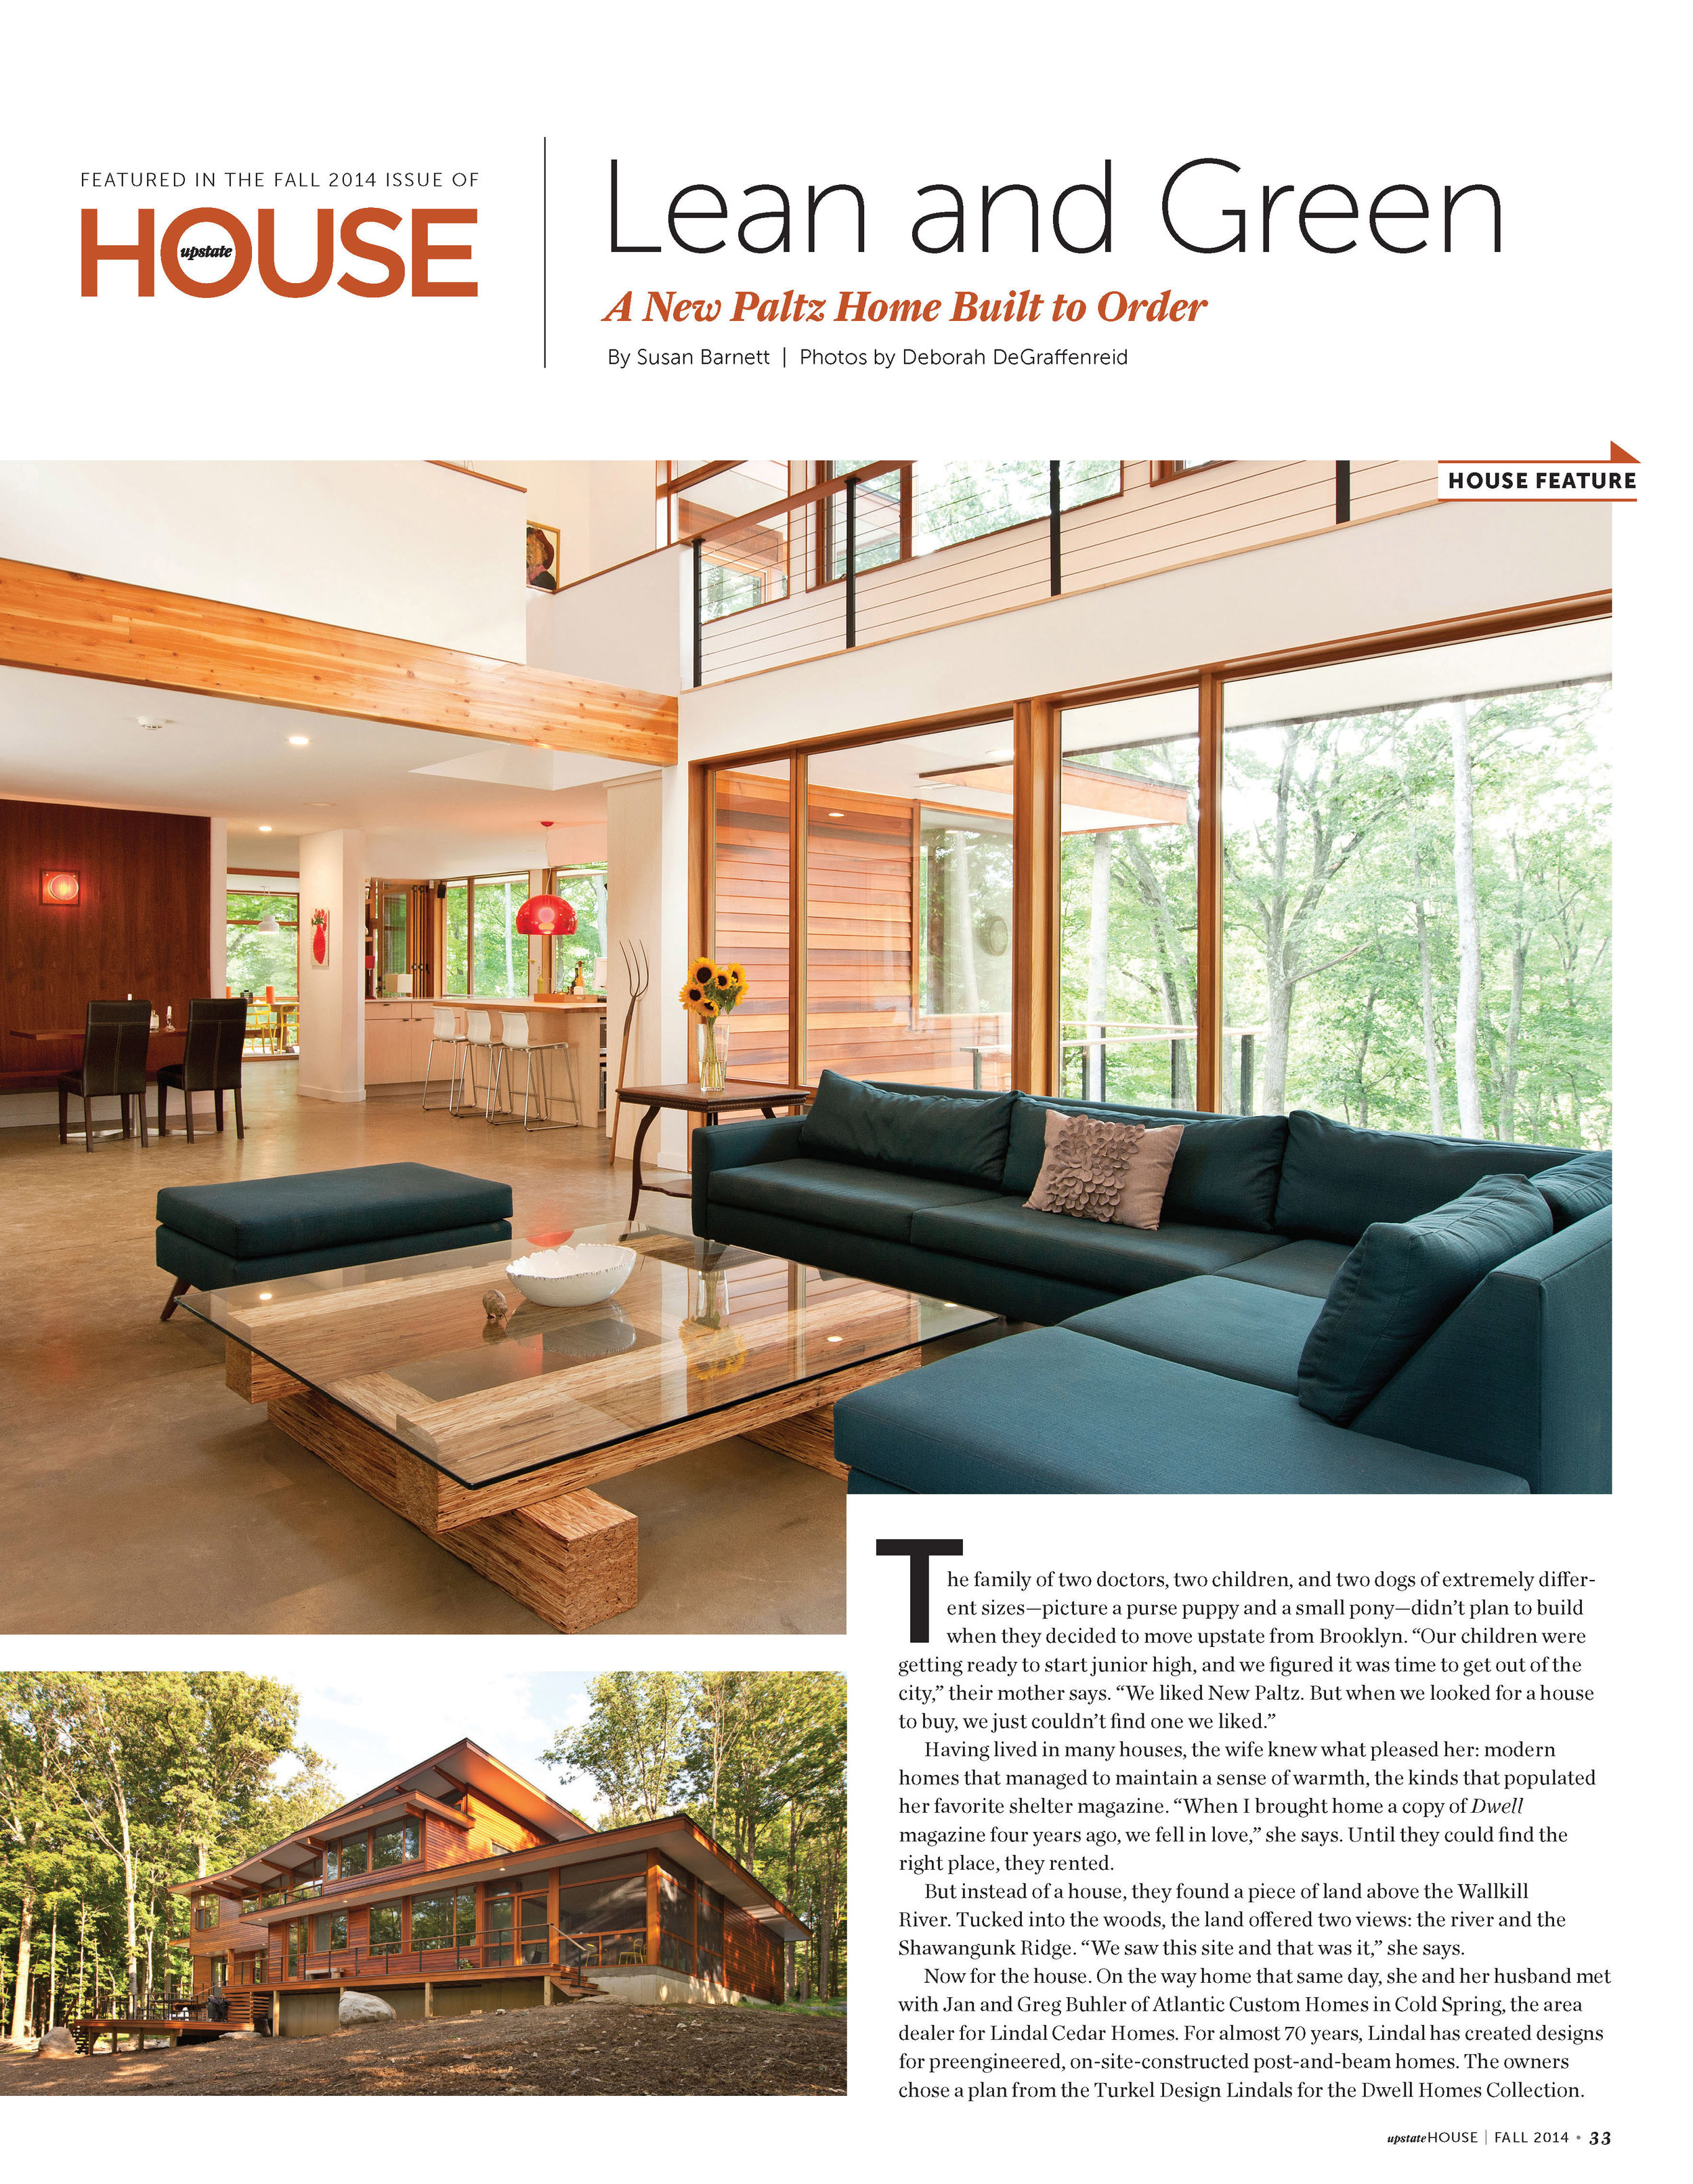 turkel_design_prefab_home_upstateny_press1.jpg